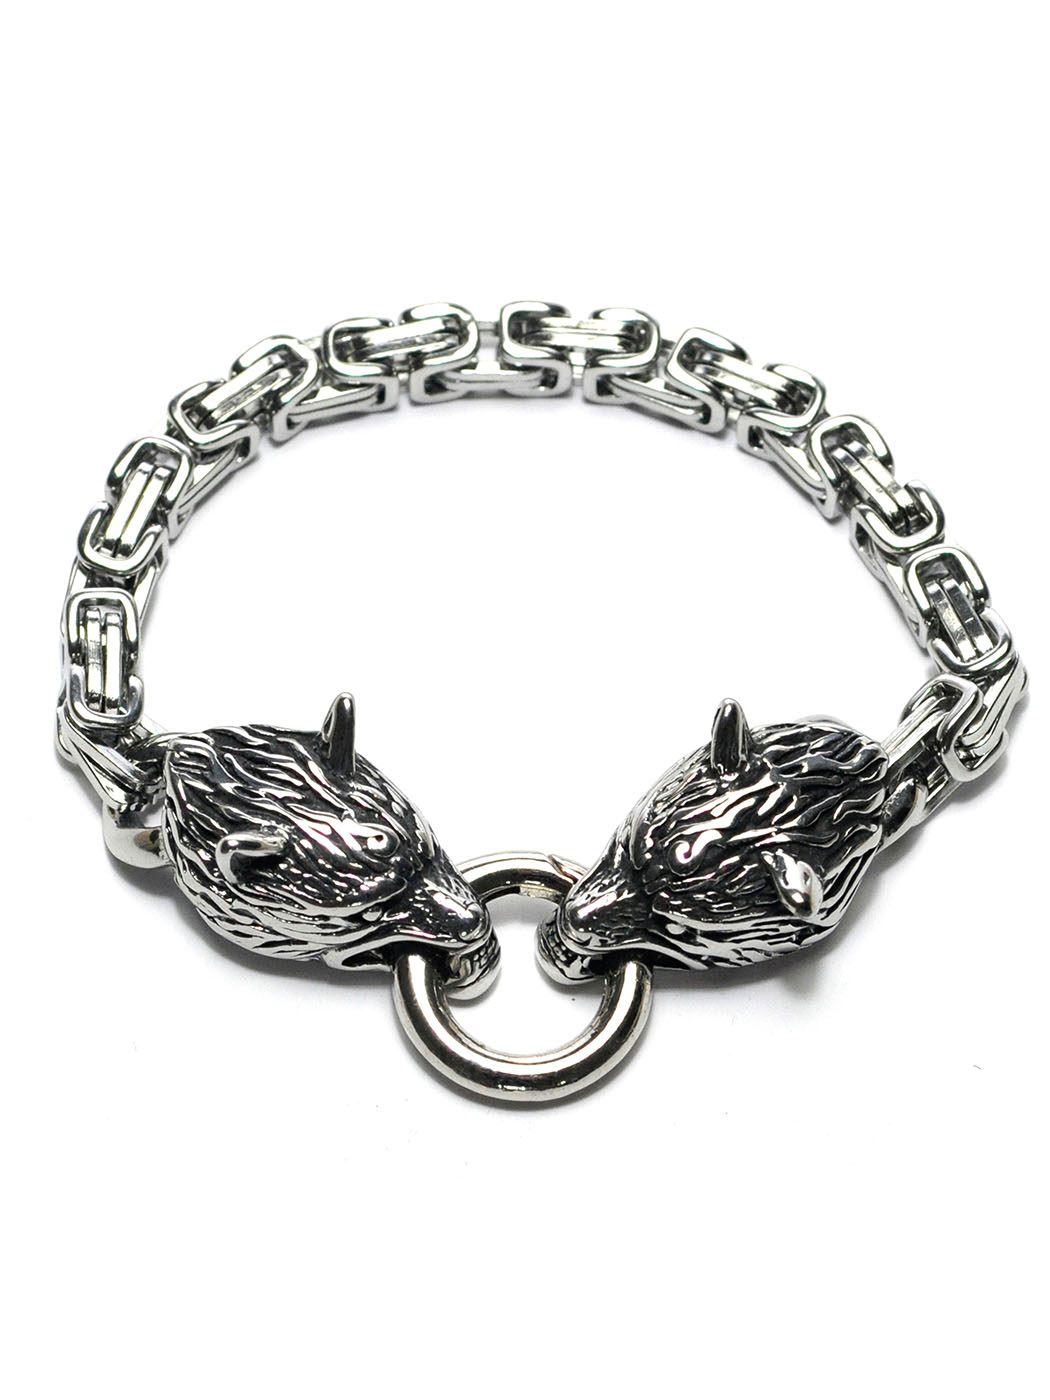 Norse Bracelet Amazon Deals New York